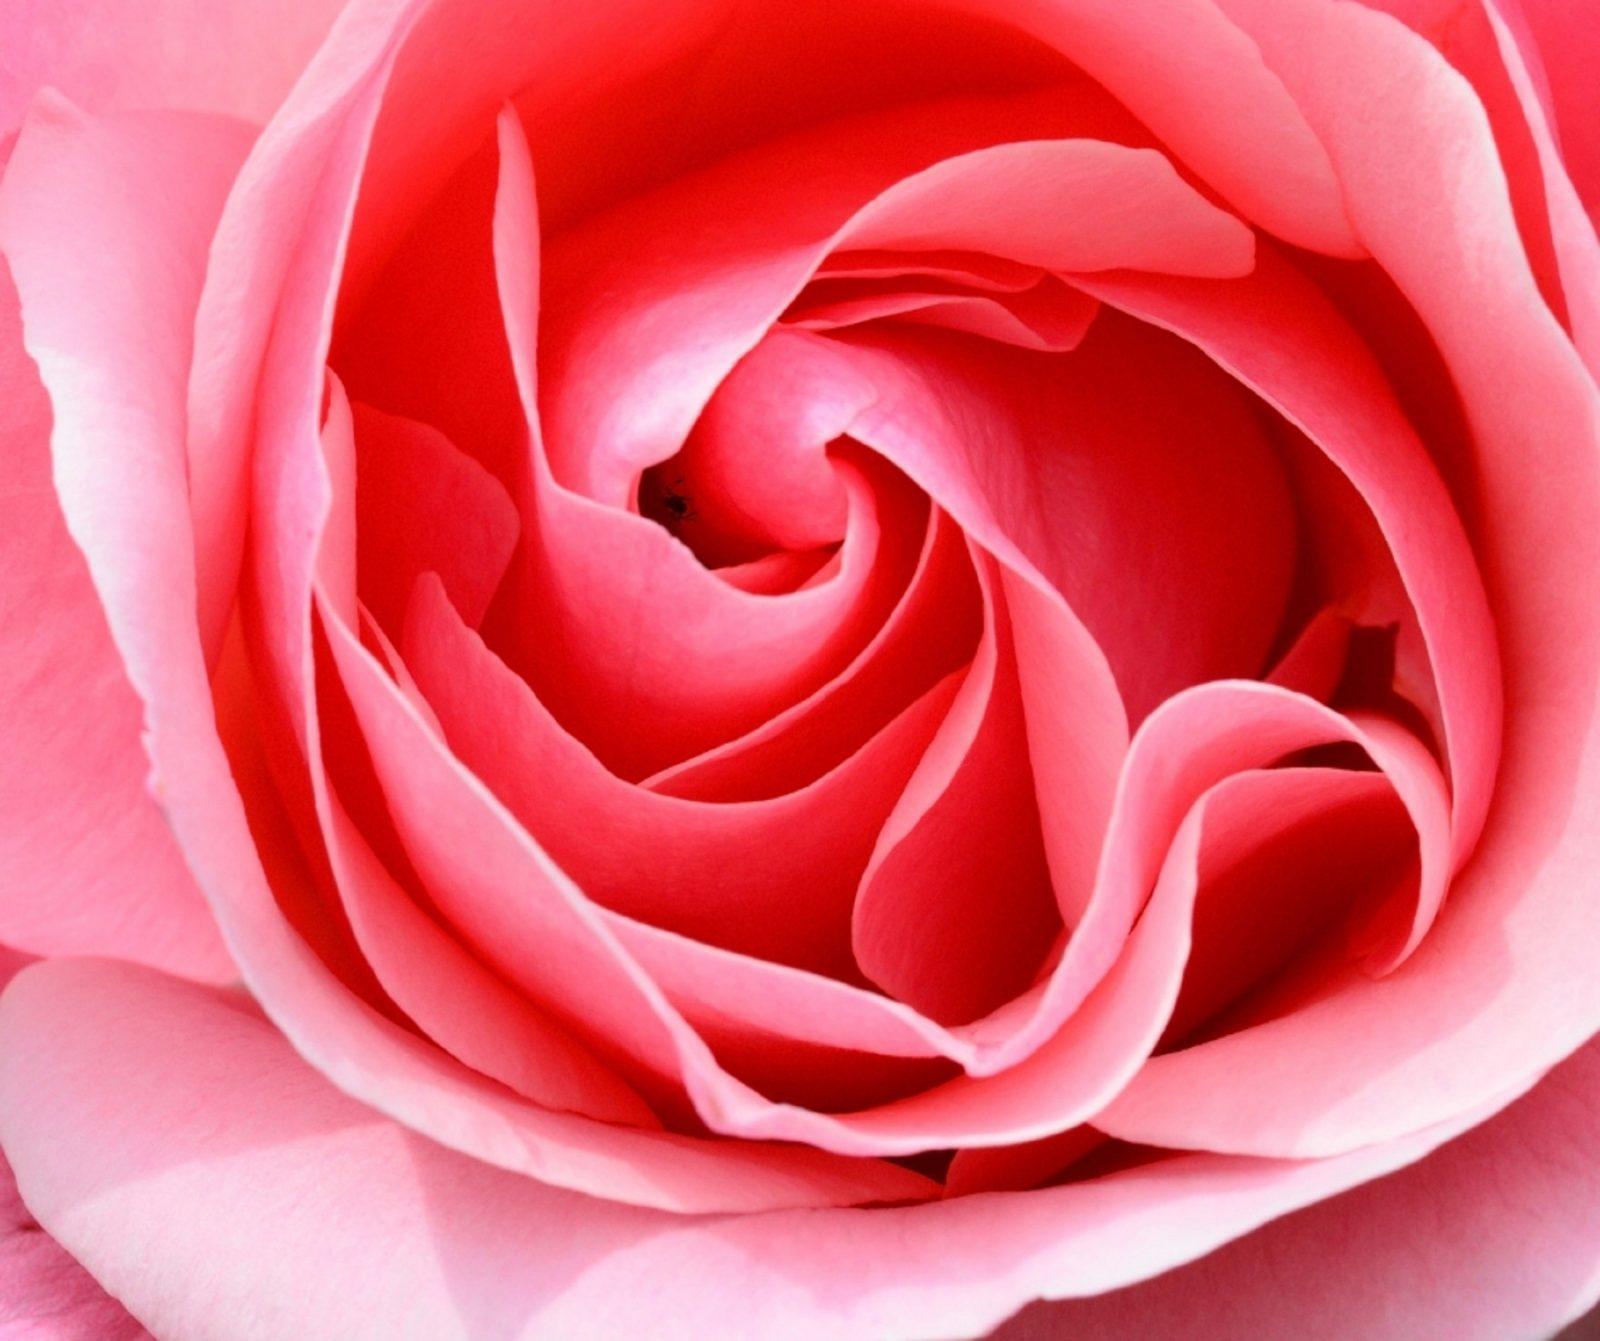 Mortlake Rose Show